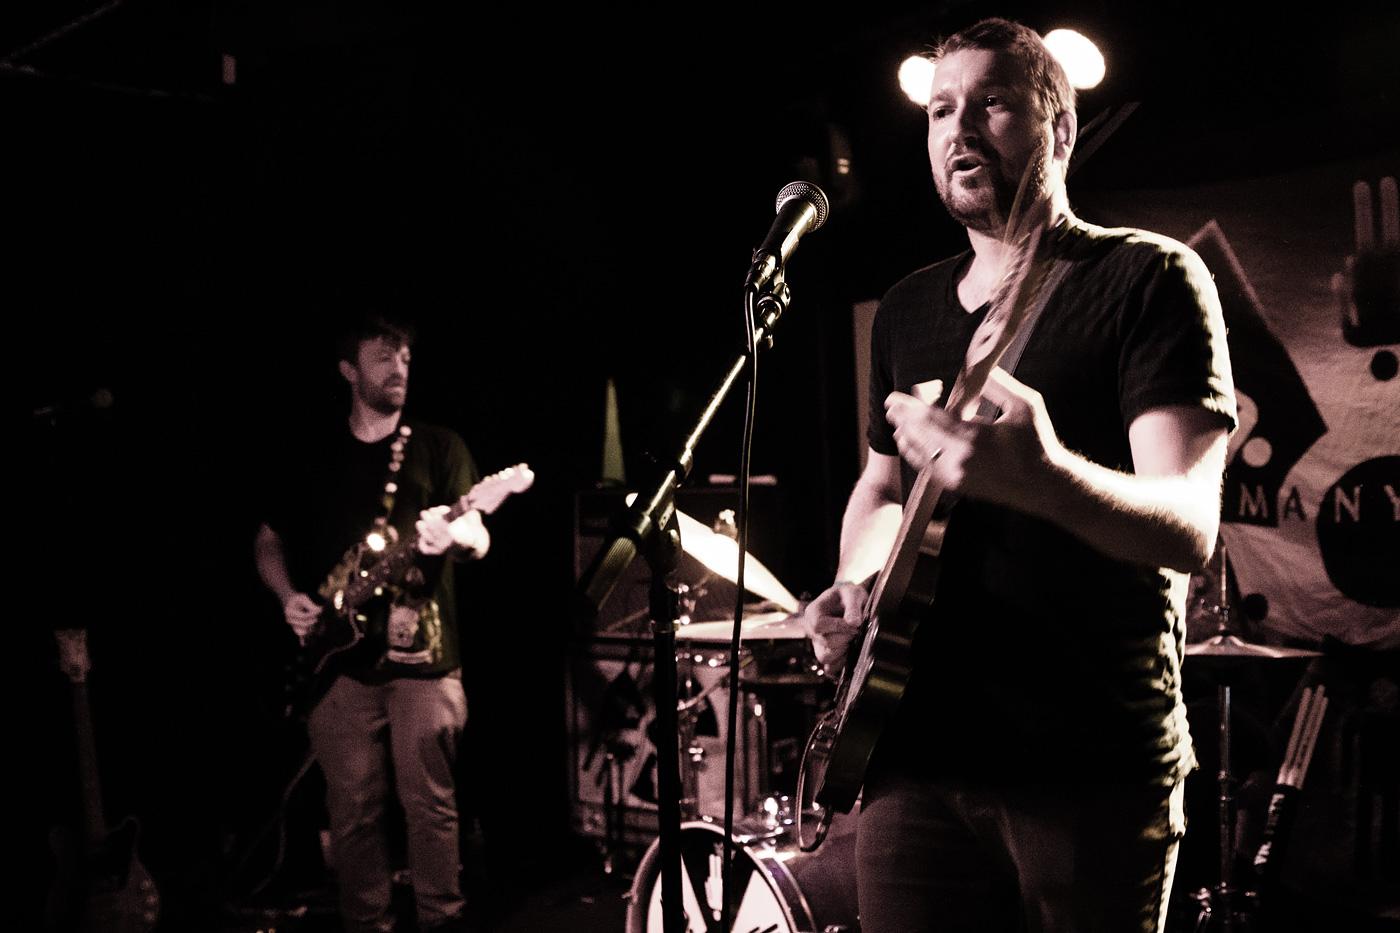 Too Many Humans - Denver Band